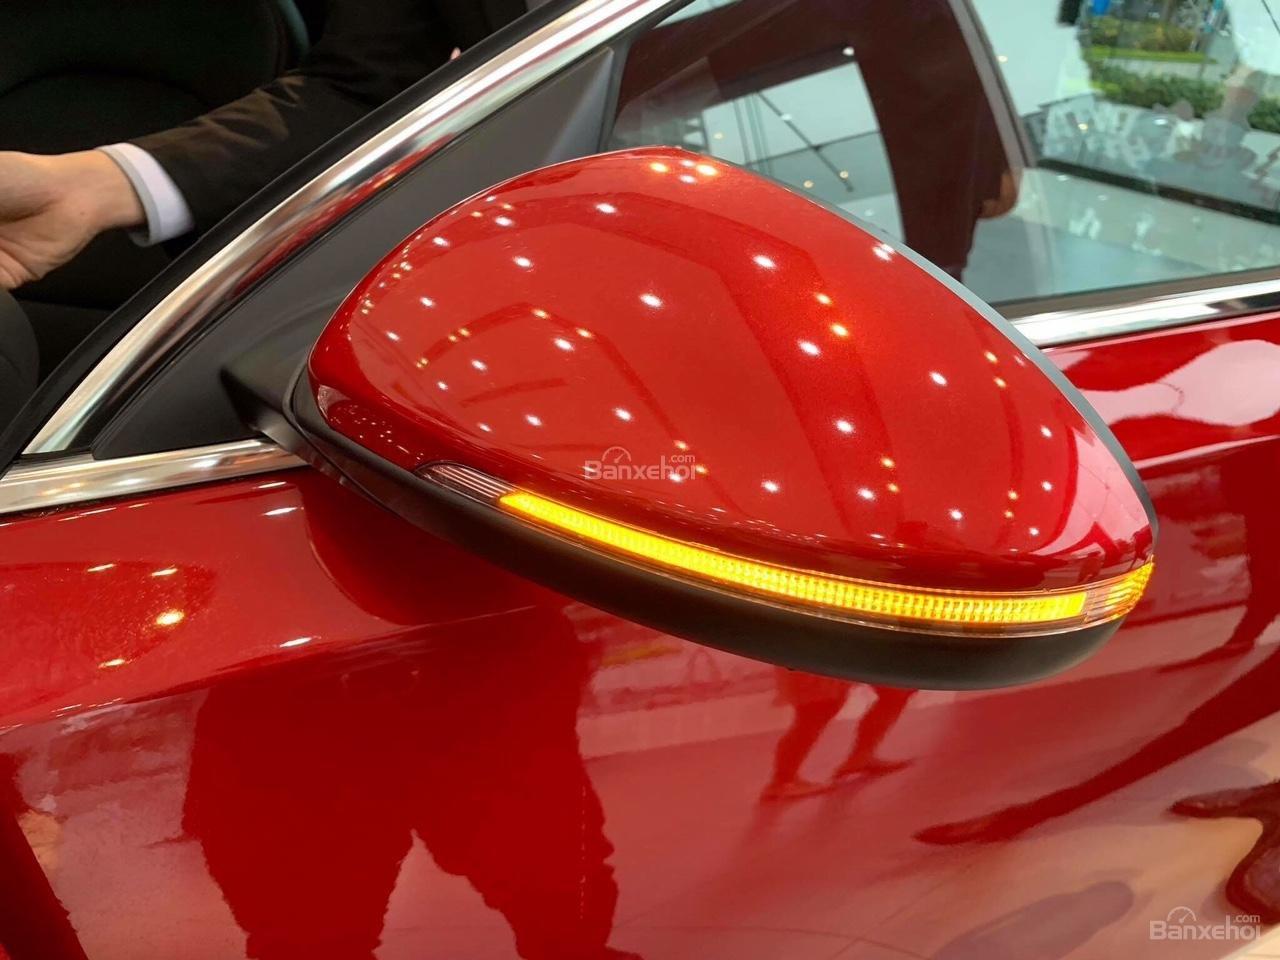 Bán Kia Cerato đời 2019 All New - Giao xe trước Tết-3